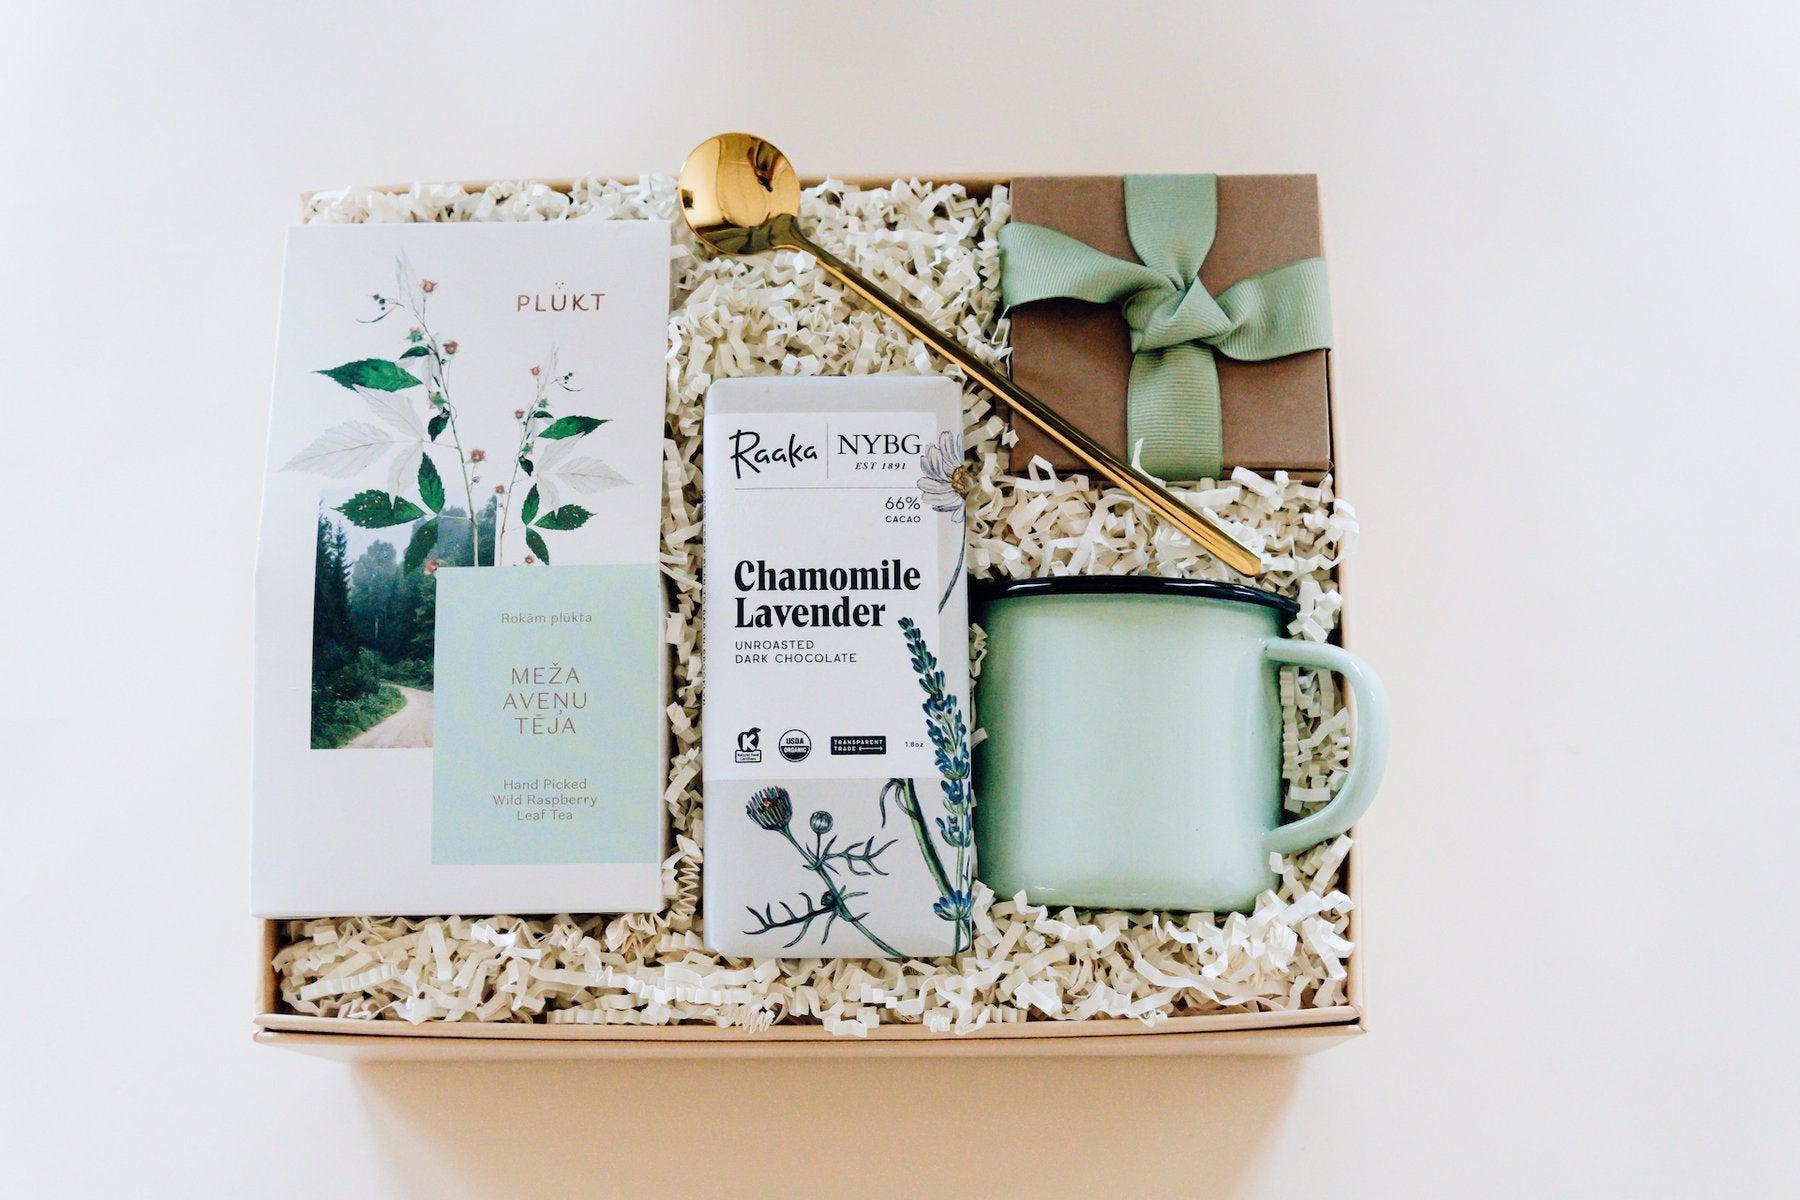 Best Gift Baskets Option: Peach Box Co. Personalized Peachbox